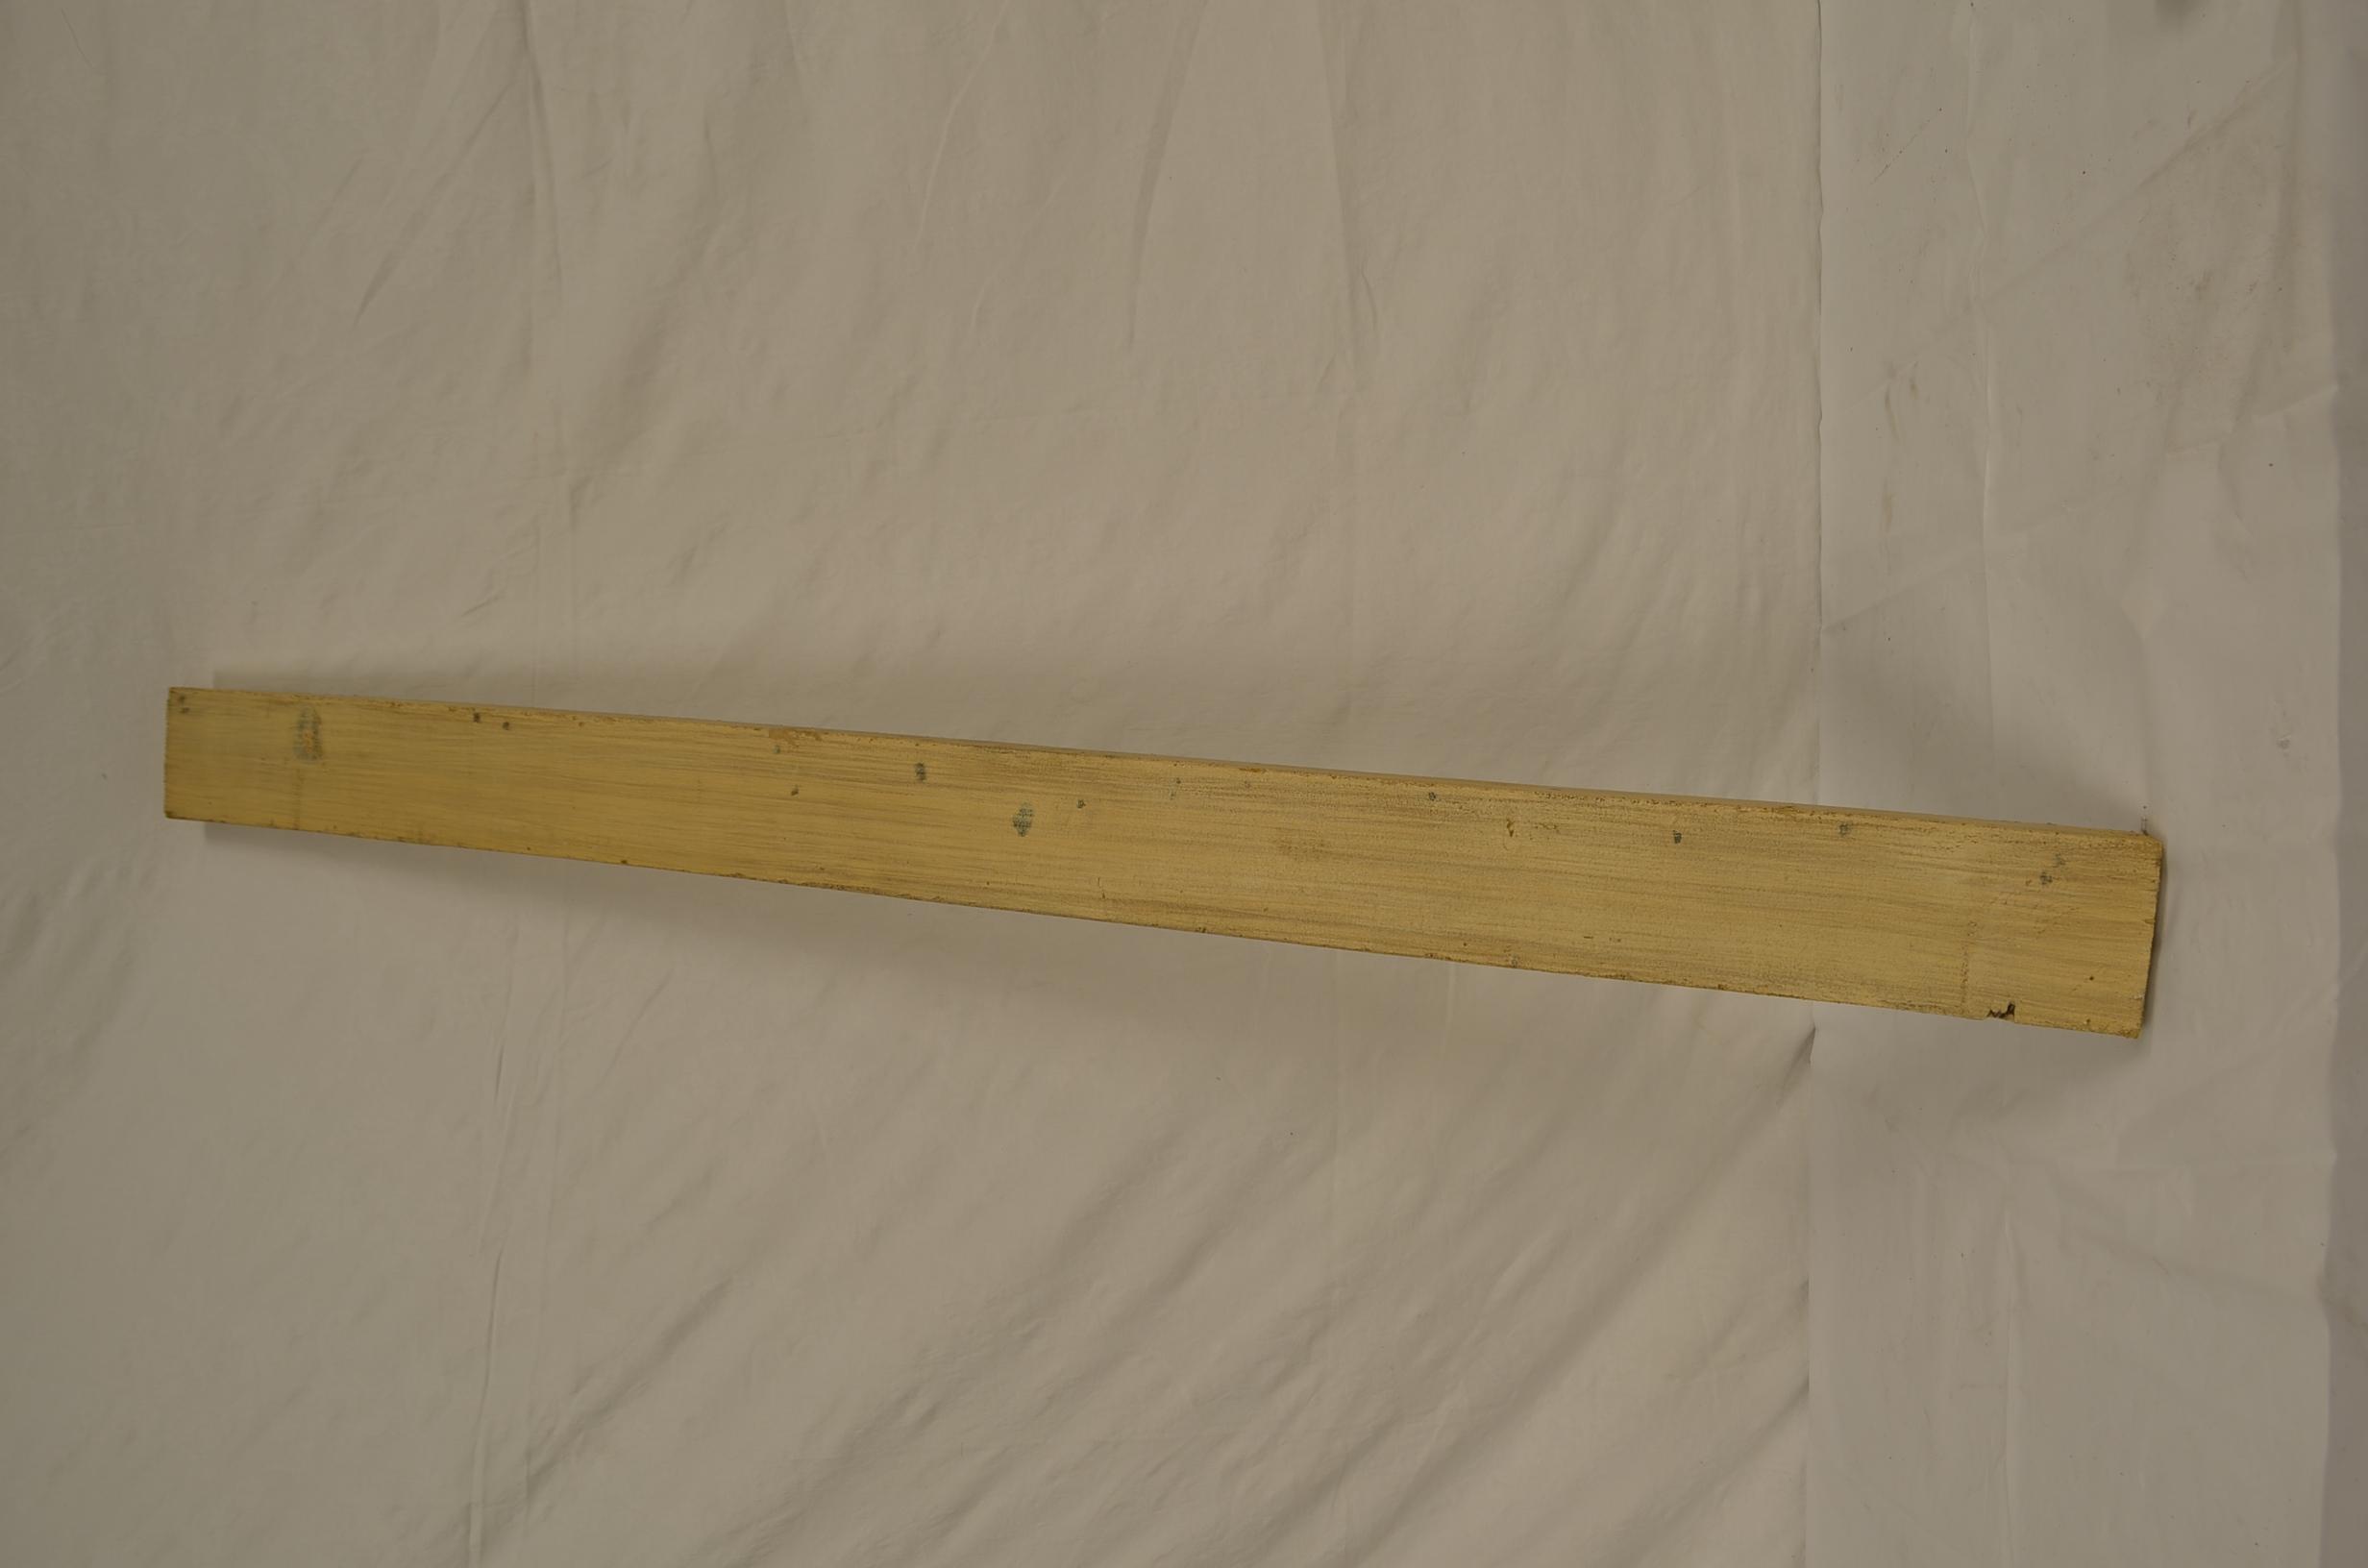 soft 2x4 lumber 6ft long